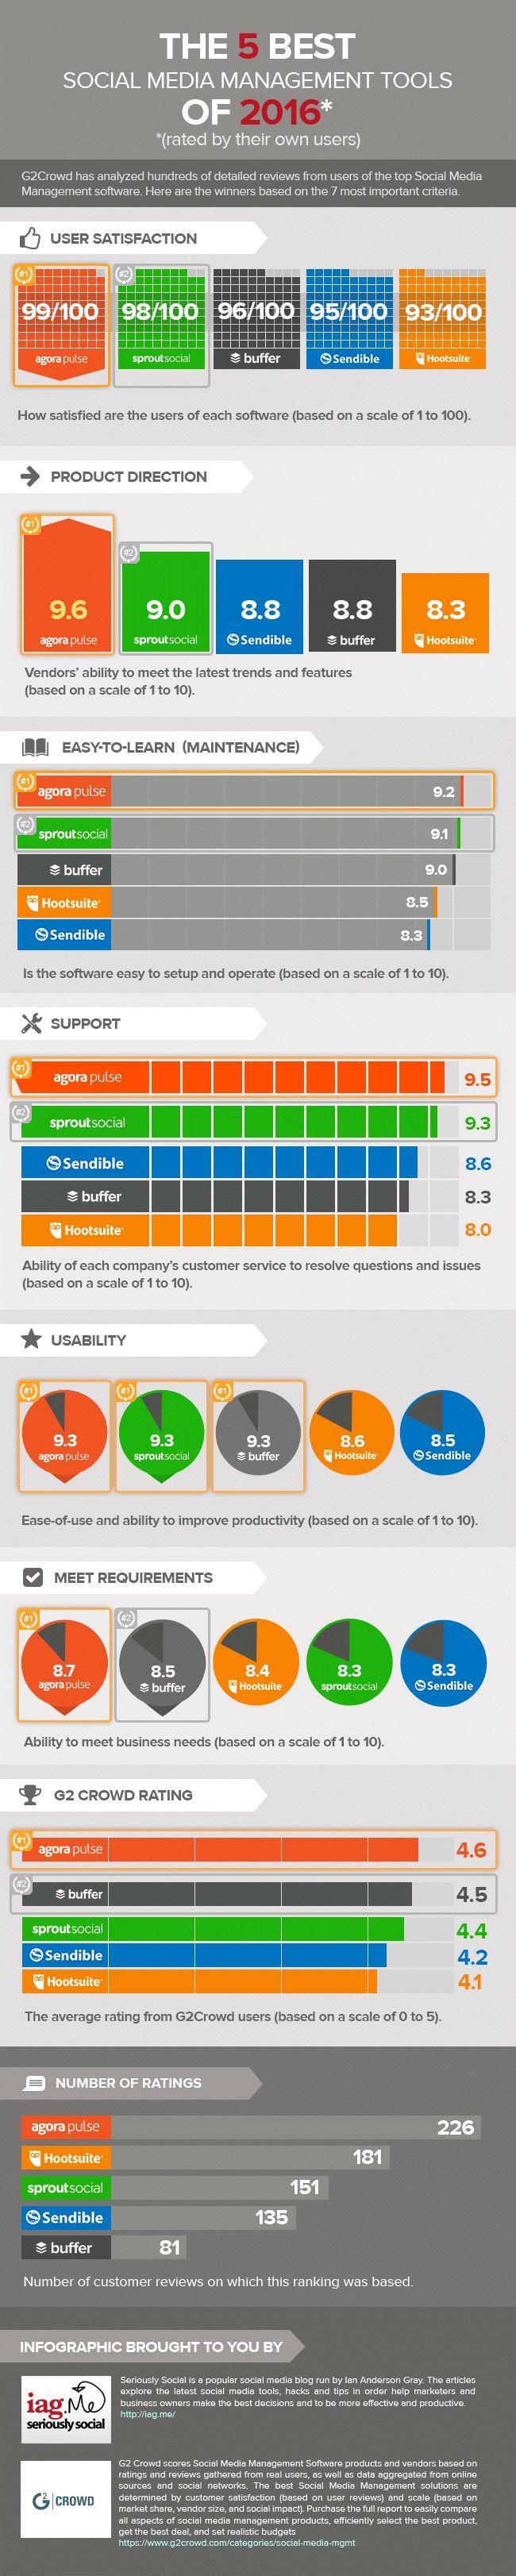 Top 5 Social Media Management Tools 2016 - infographic